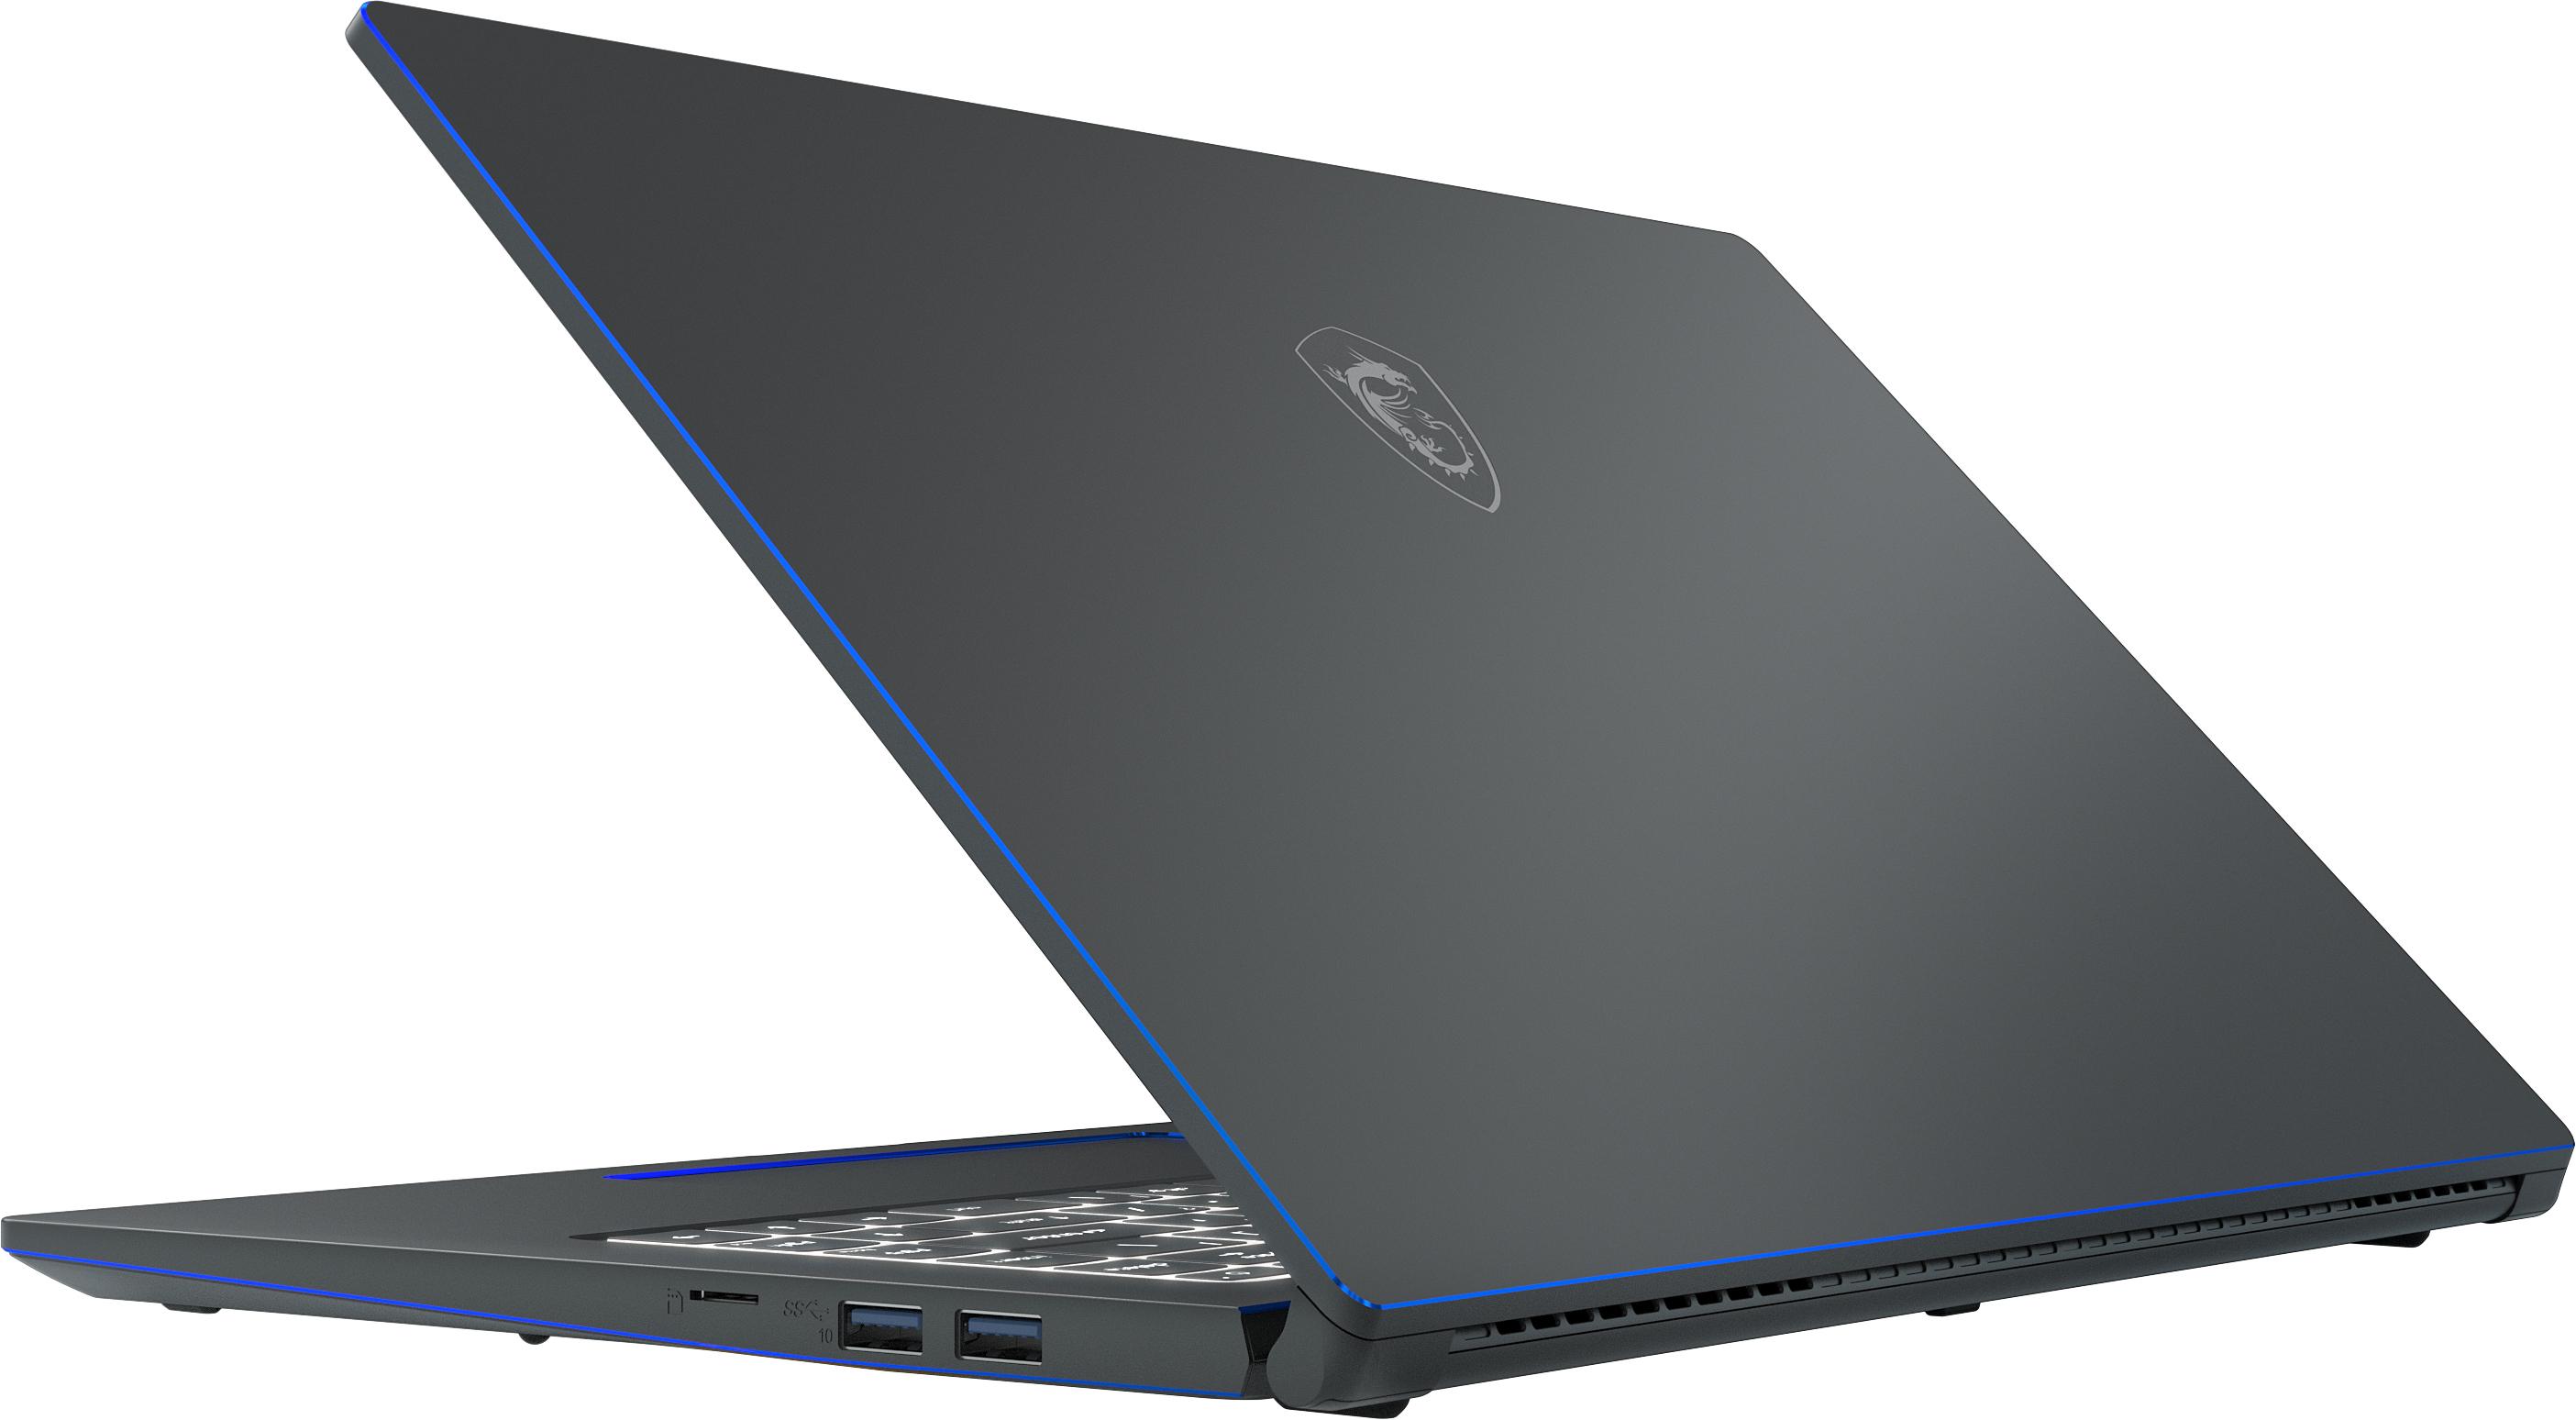 MSI's New Prestige 14 & 15 Laptops Get Intel's Comet Lake-U